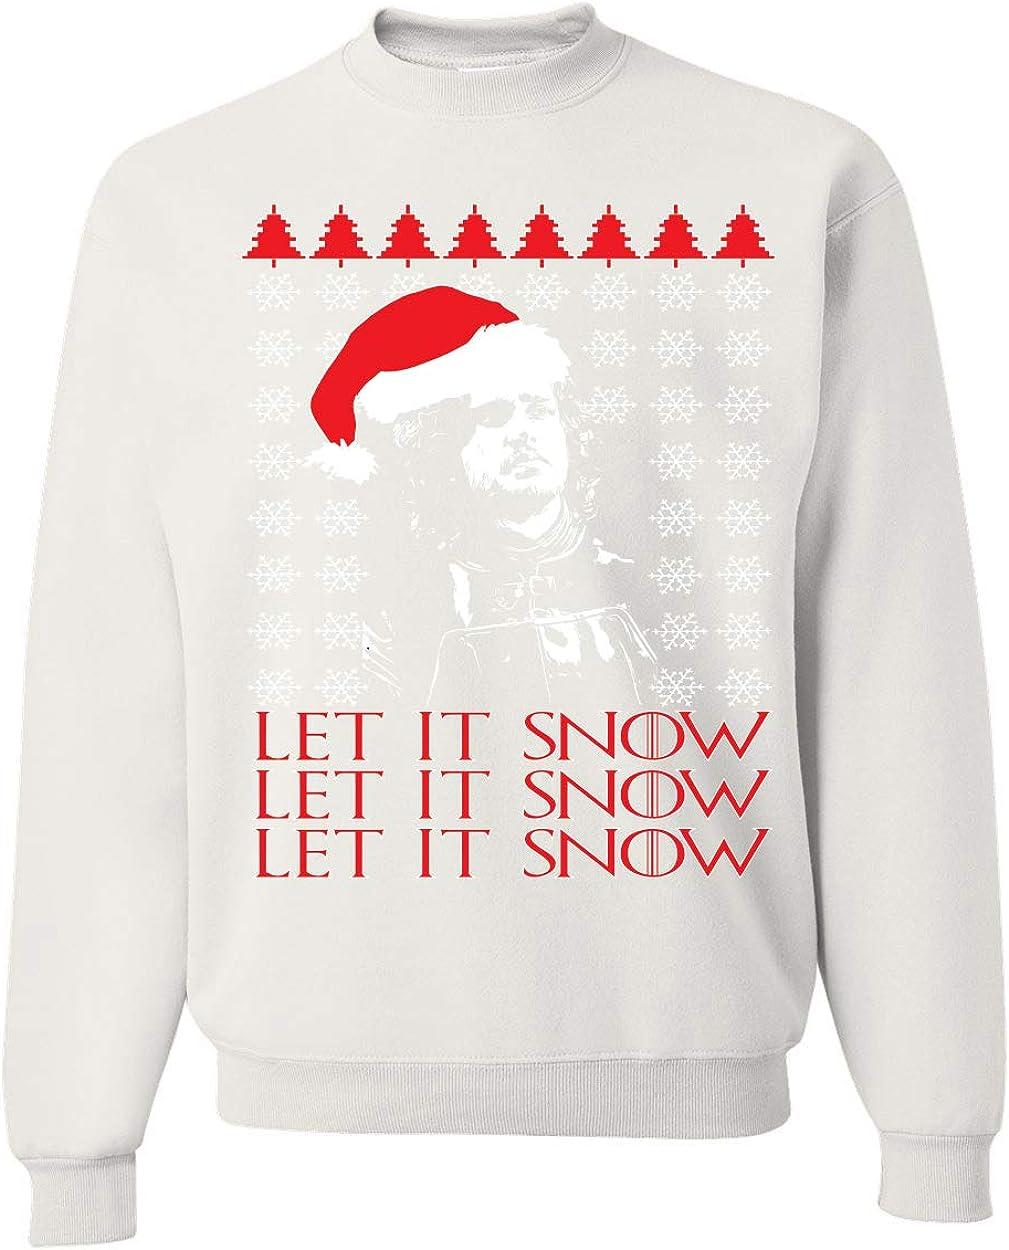 Let Al sold out. It Snow X3 Jon Santa GoT Thrones Nippon regular agency Ugly Christmas Mens